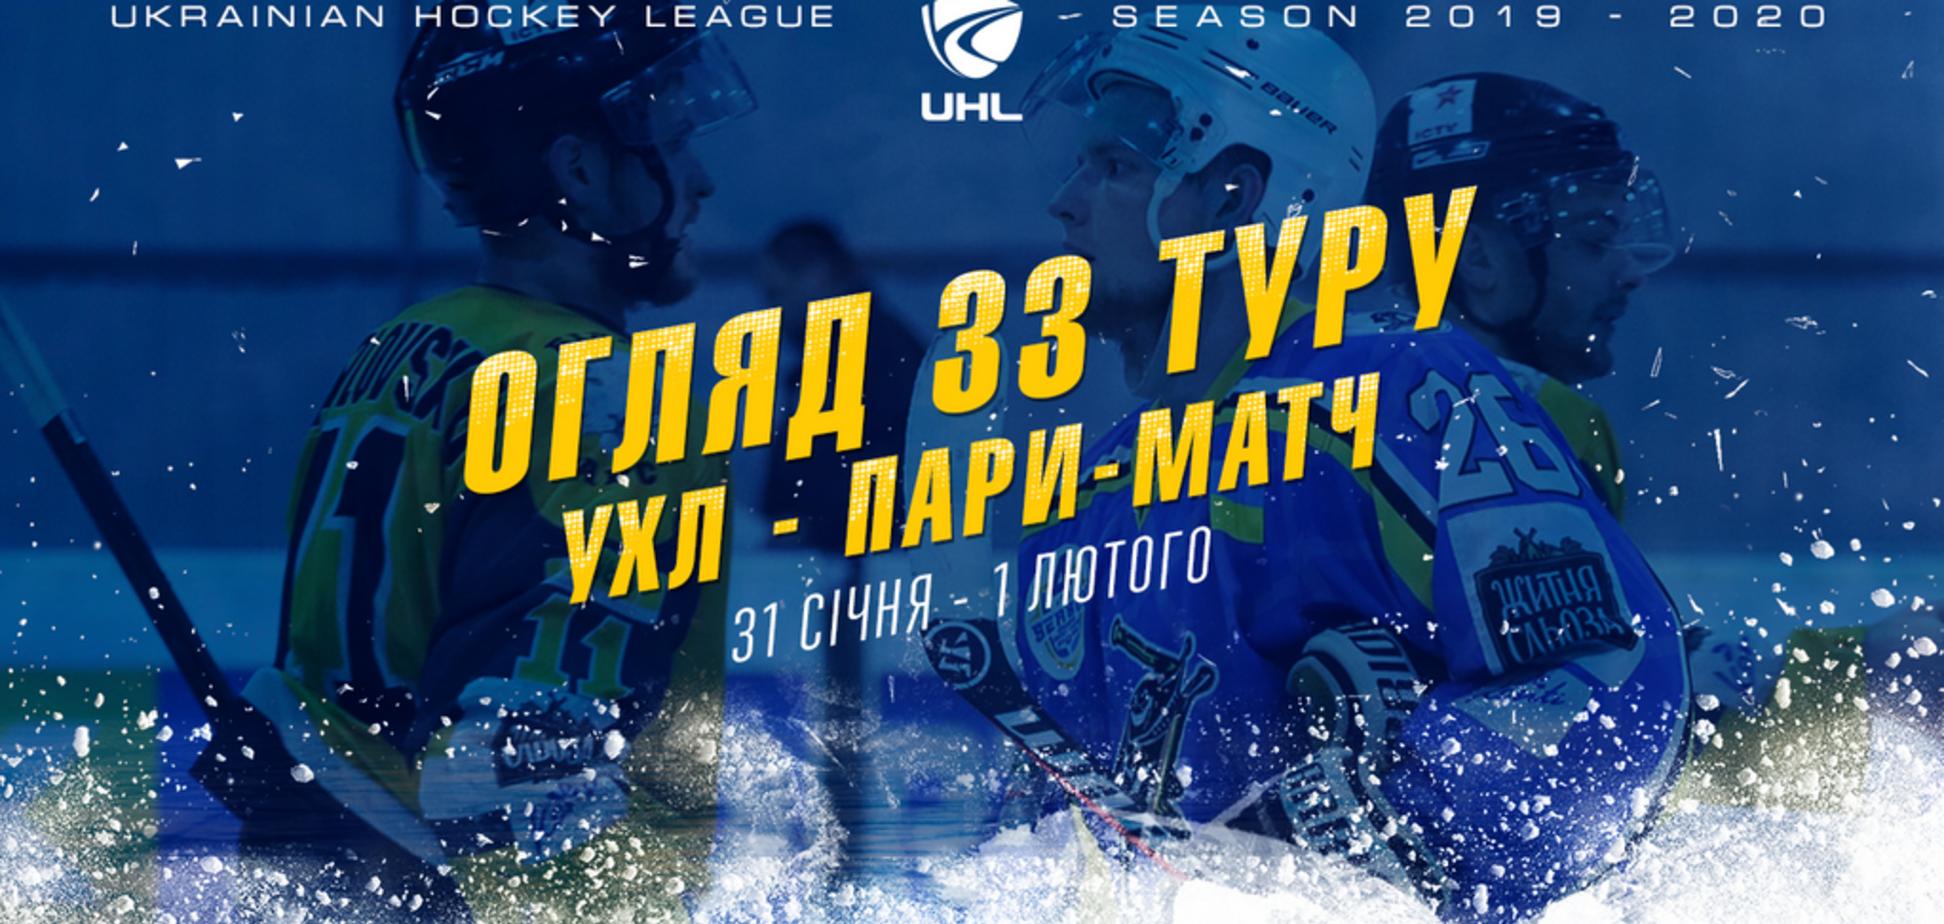 21 шайба от 'Донбасса': обзор 33-го тура УХЛ, таблица